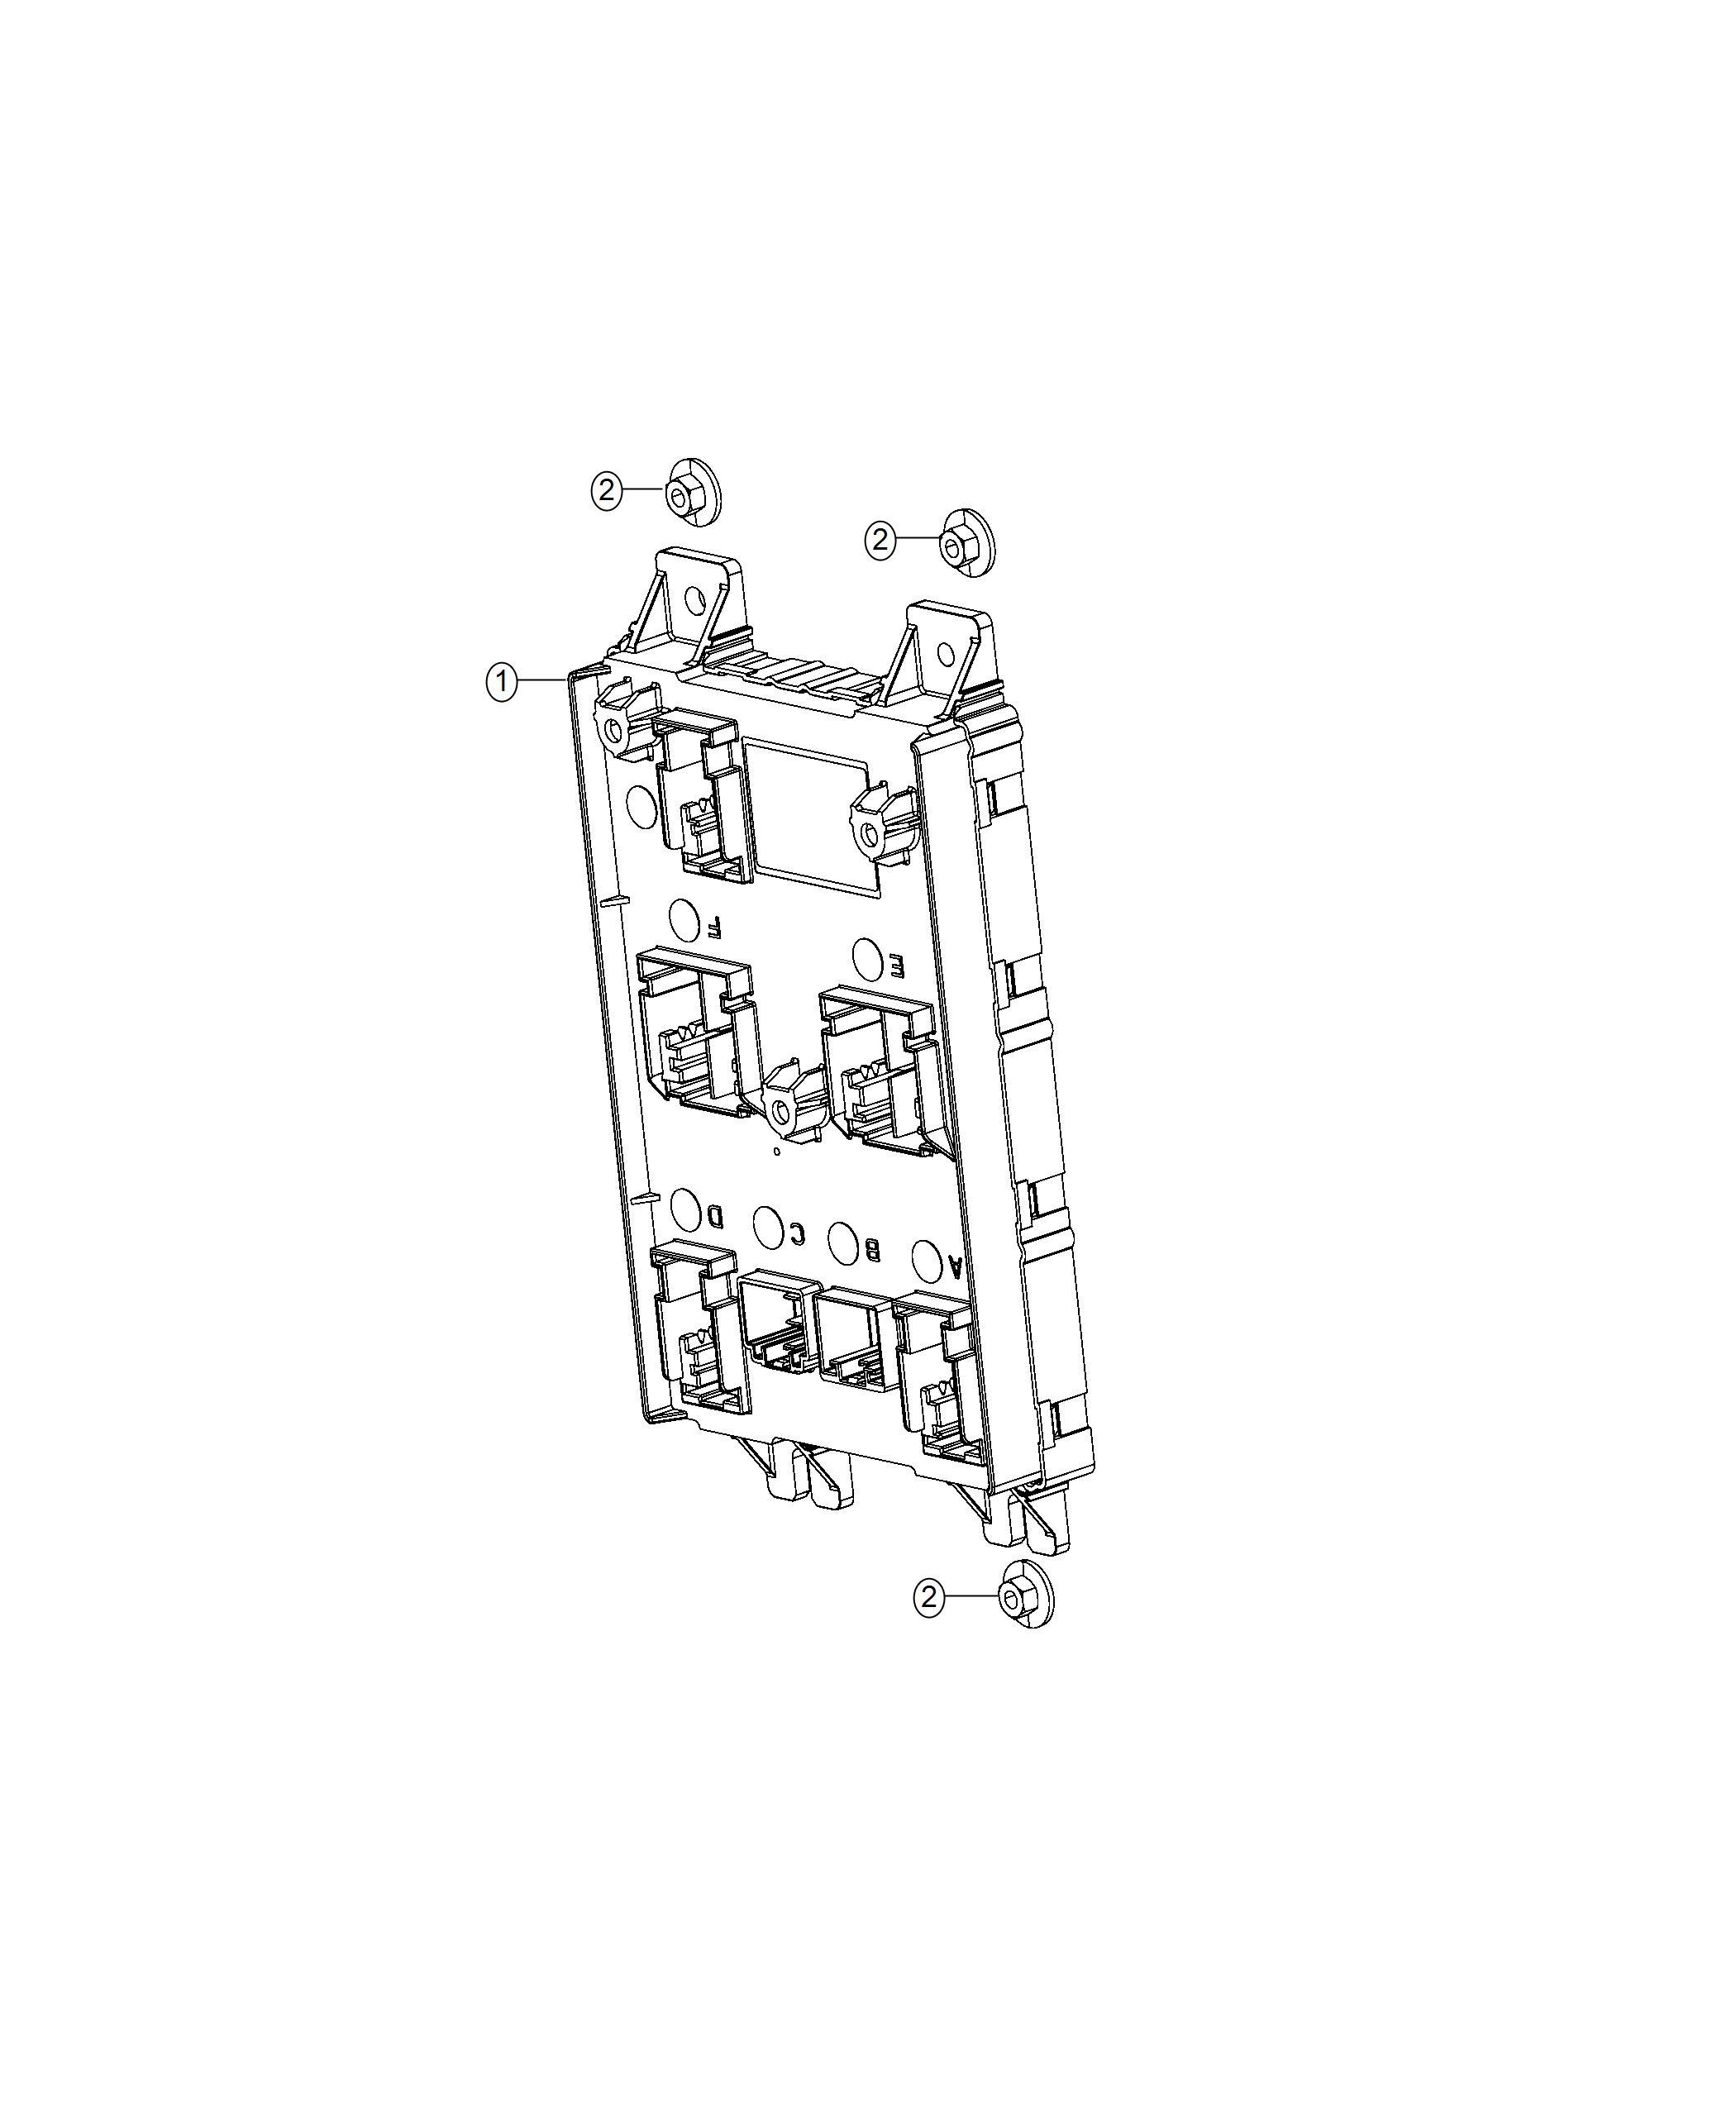 Dodge Charger Wiring Diagram On Nissan Sentra Headlamp Wiring Diagram